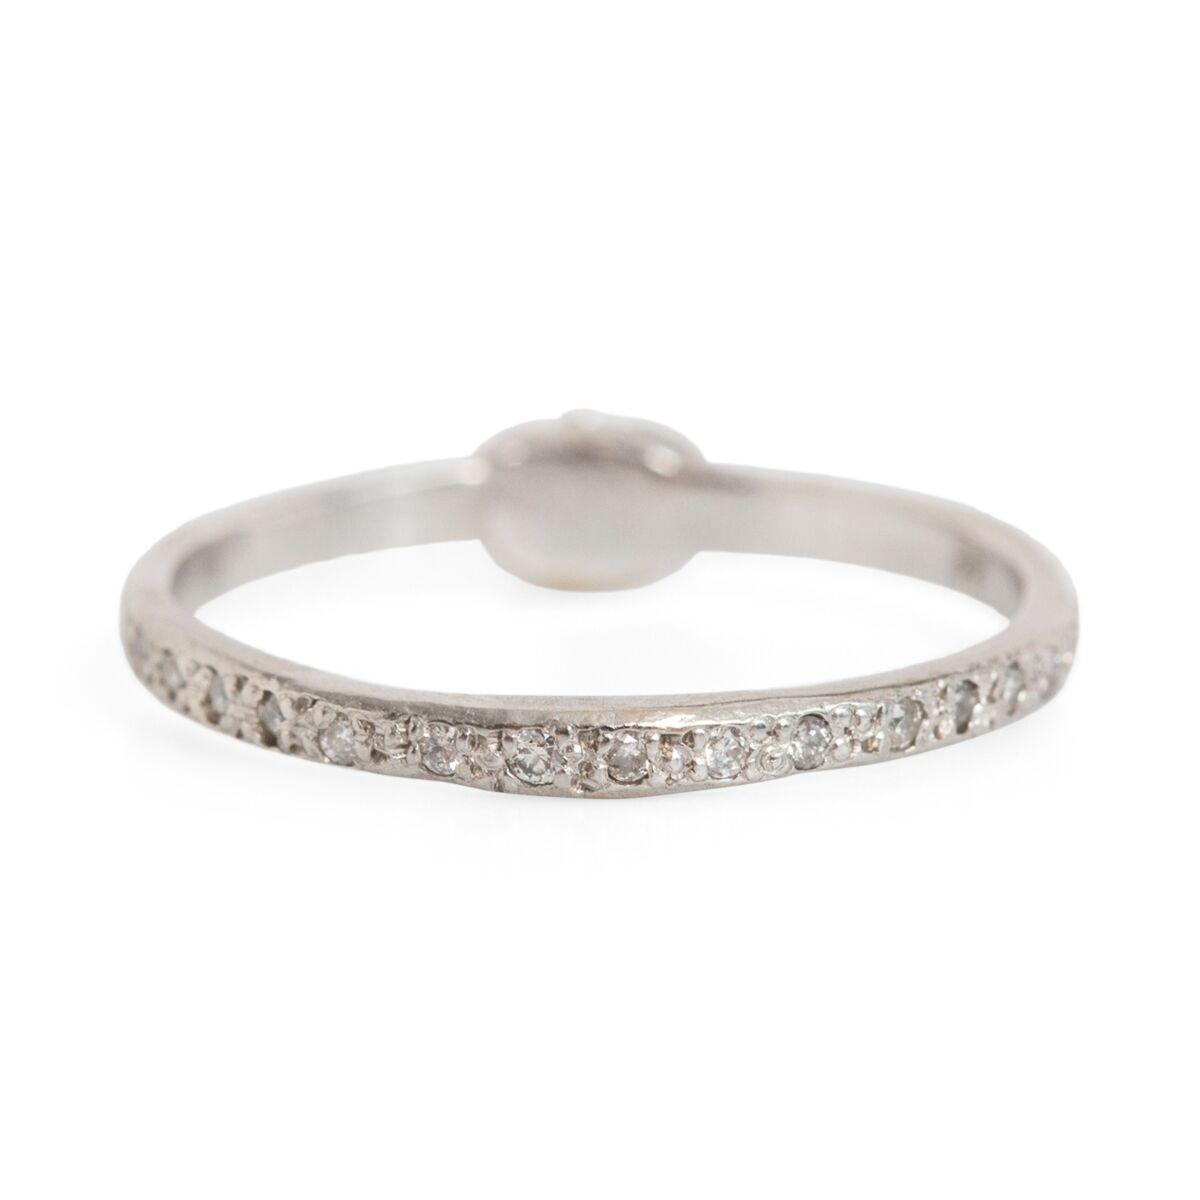 Anna Karenina Marquise Diamond Ring